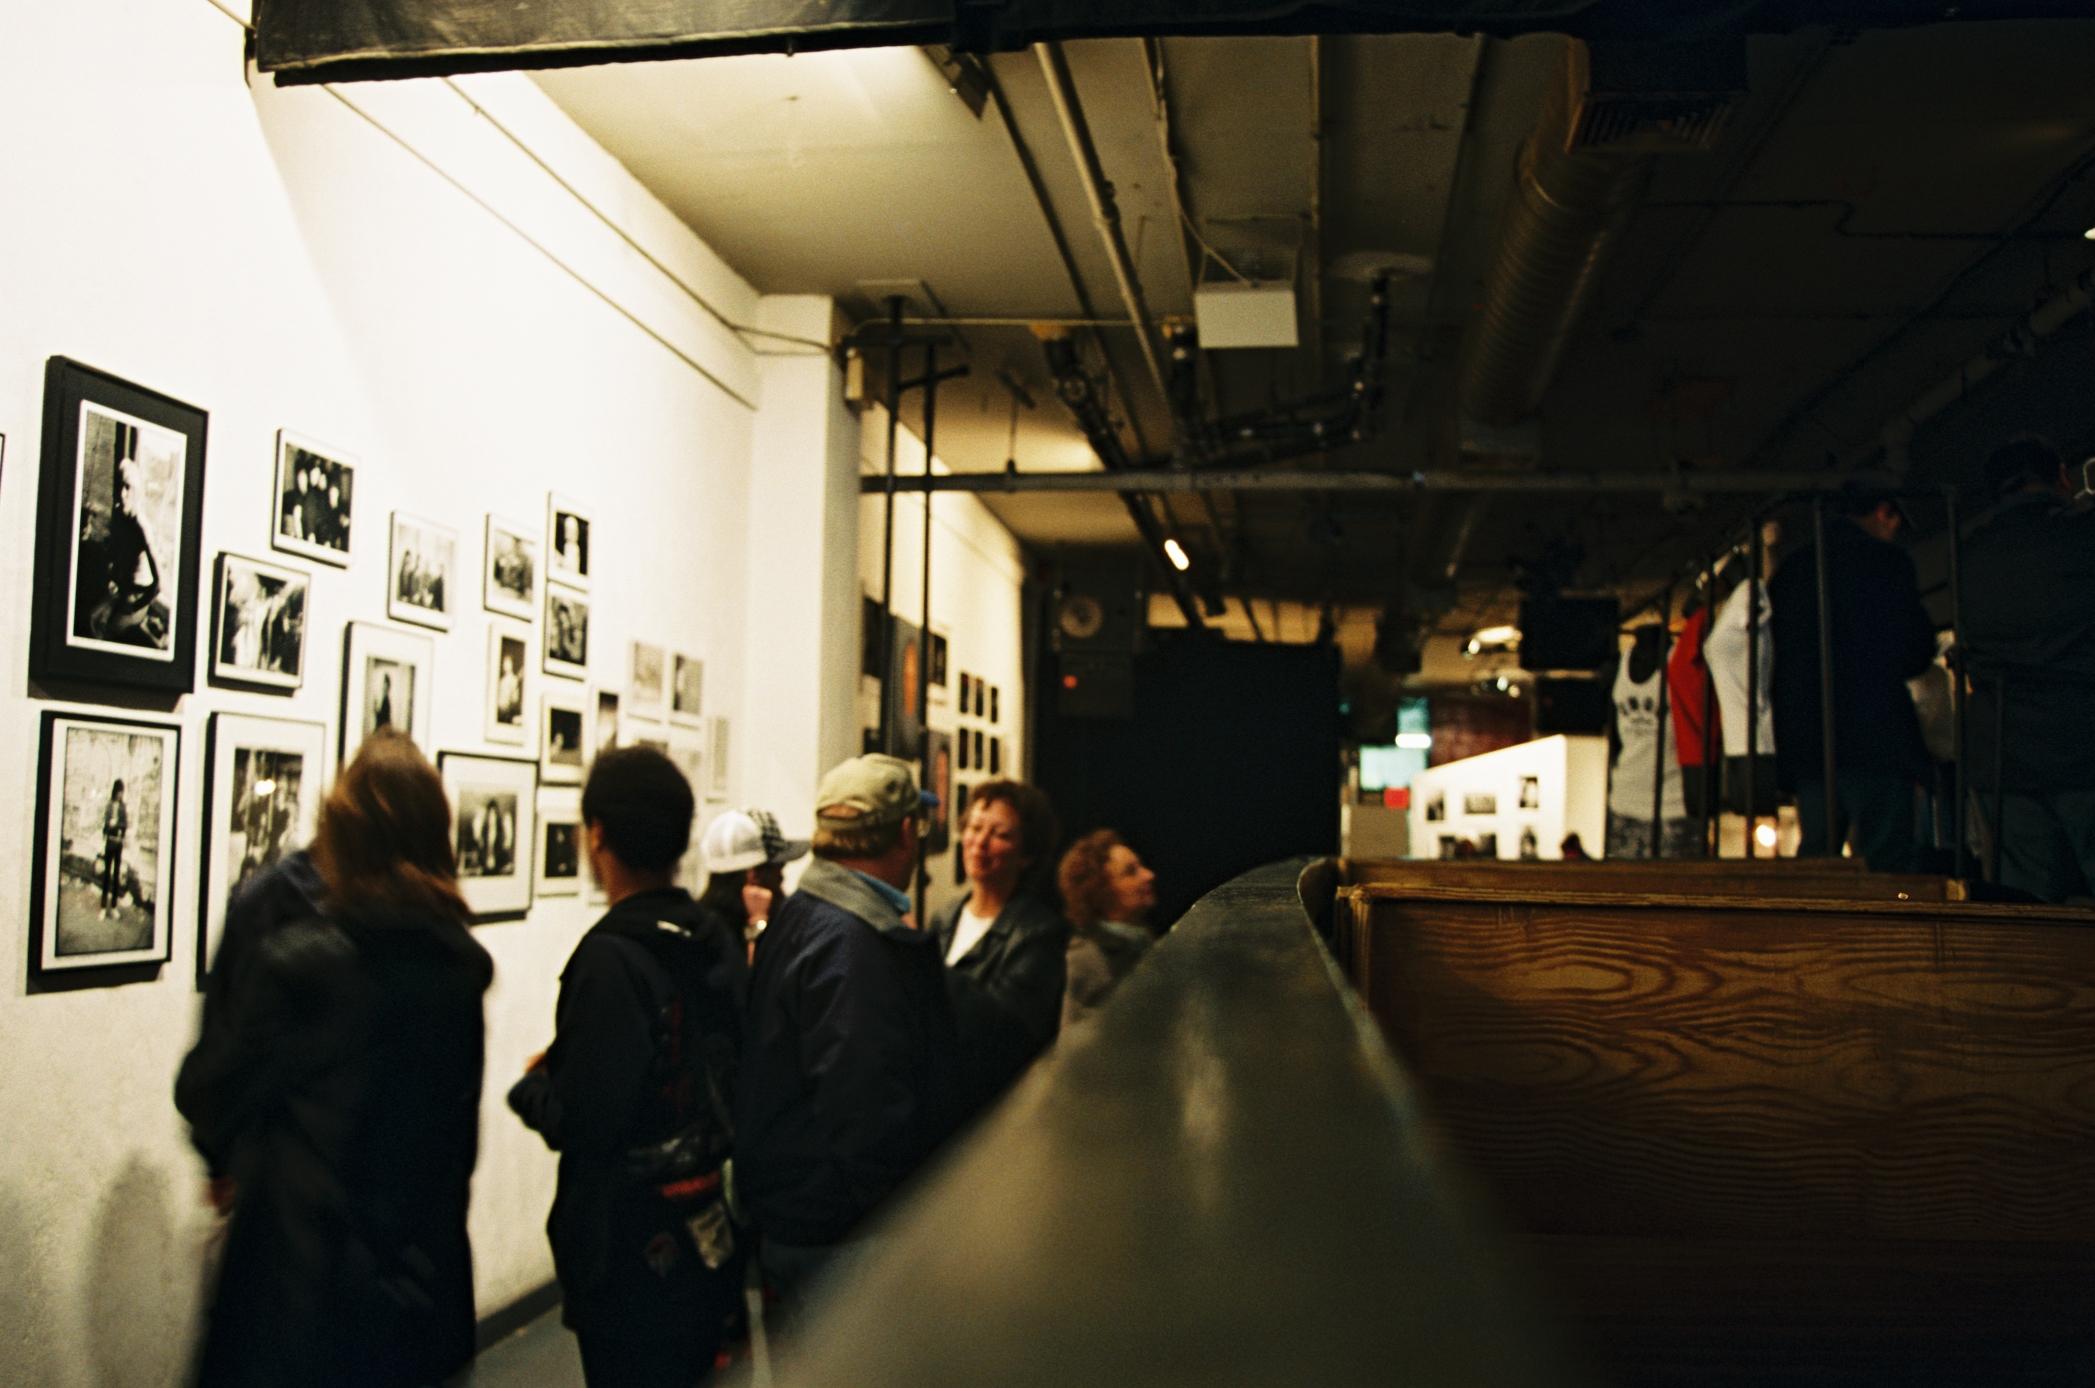 The CBGB Gallery, 2005, 35mm color slide.